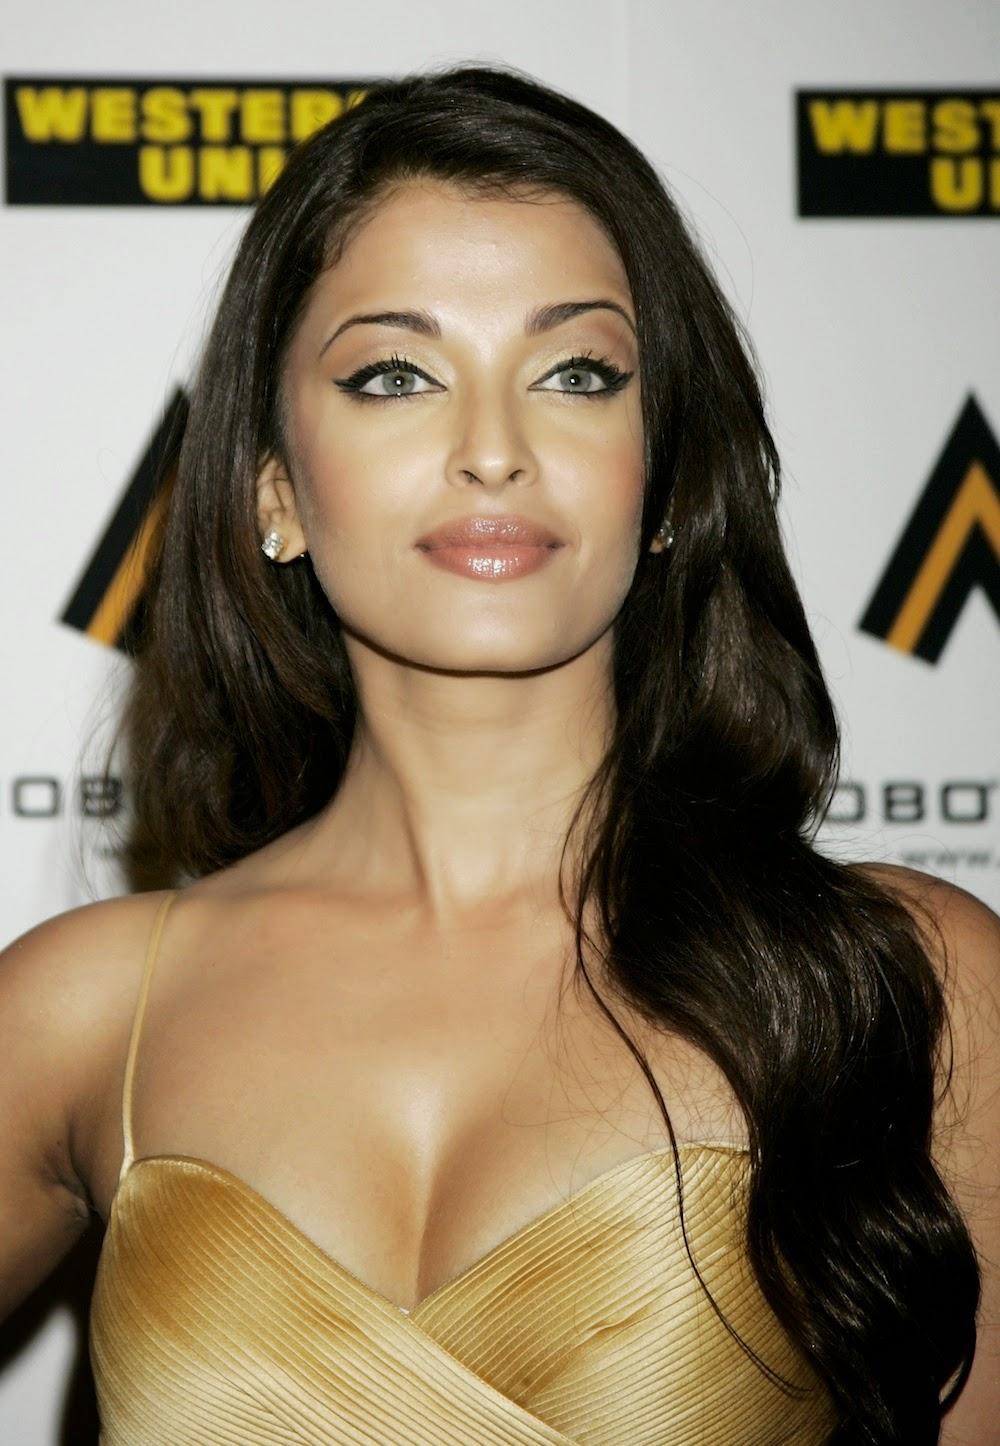 Aishwarya Rai Latest Showing Hot Boobs Bikini Images 2014-15   Beautiful World Celebrities